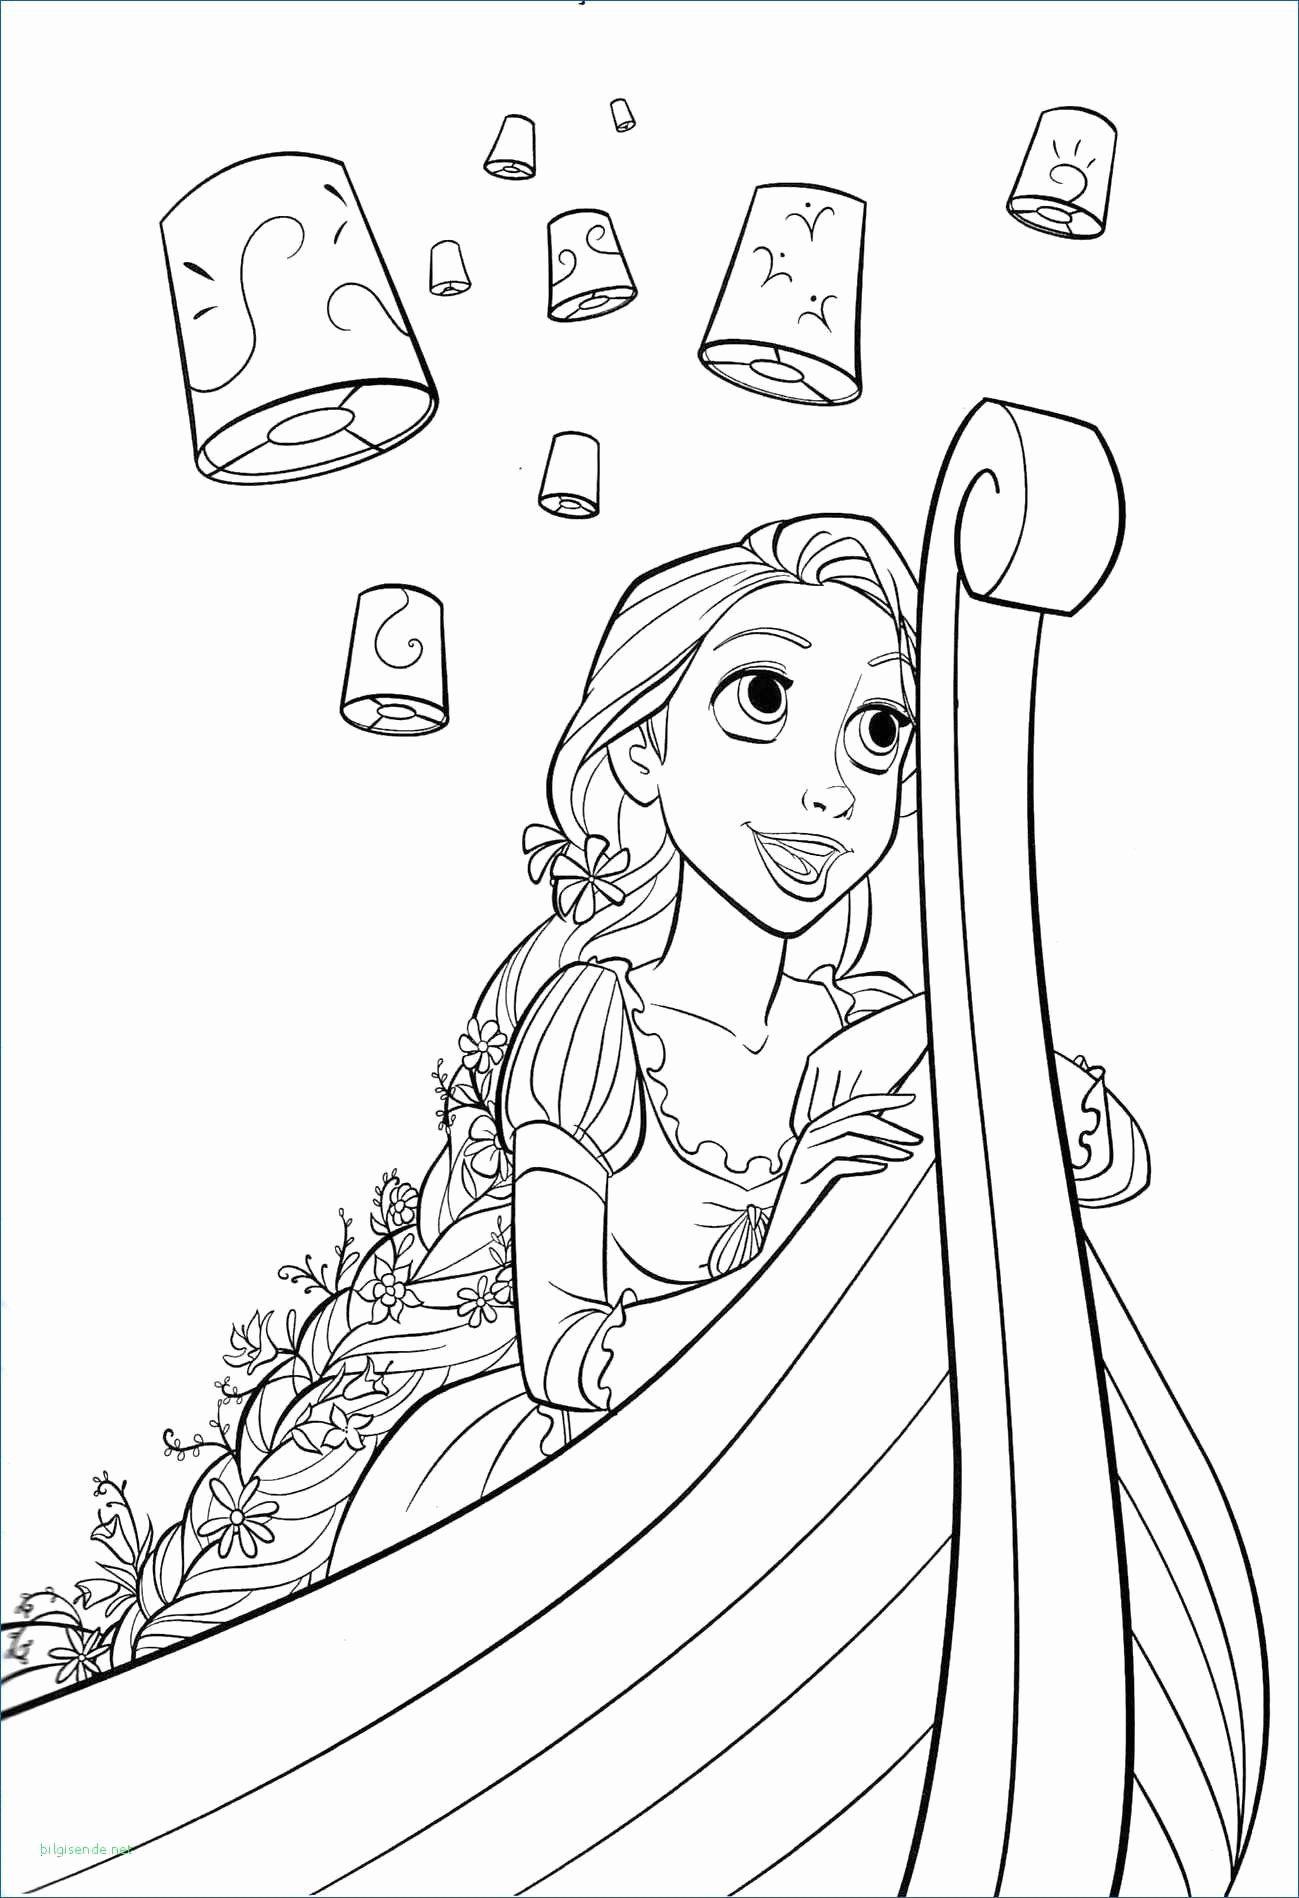 Princess Coloring And Activities Book Elegant Coloring Books Tremendous Disney Princess Coloring Free In 2020 Tangled Coloring Pages Disney Princess Coloring Pages Princess Coloring Pages